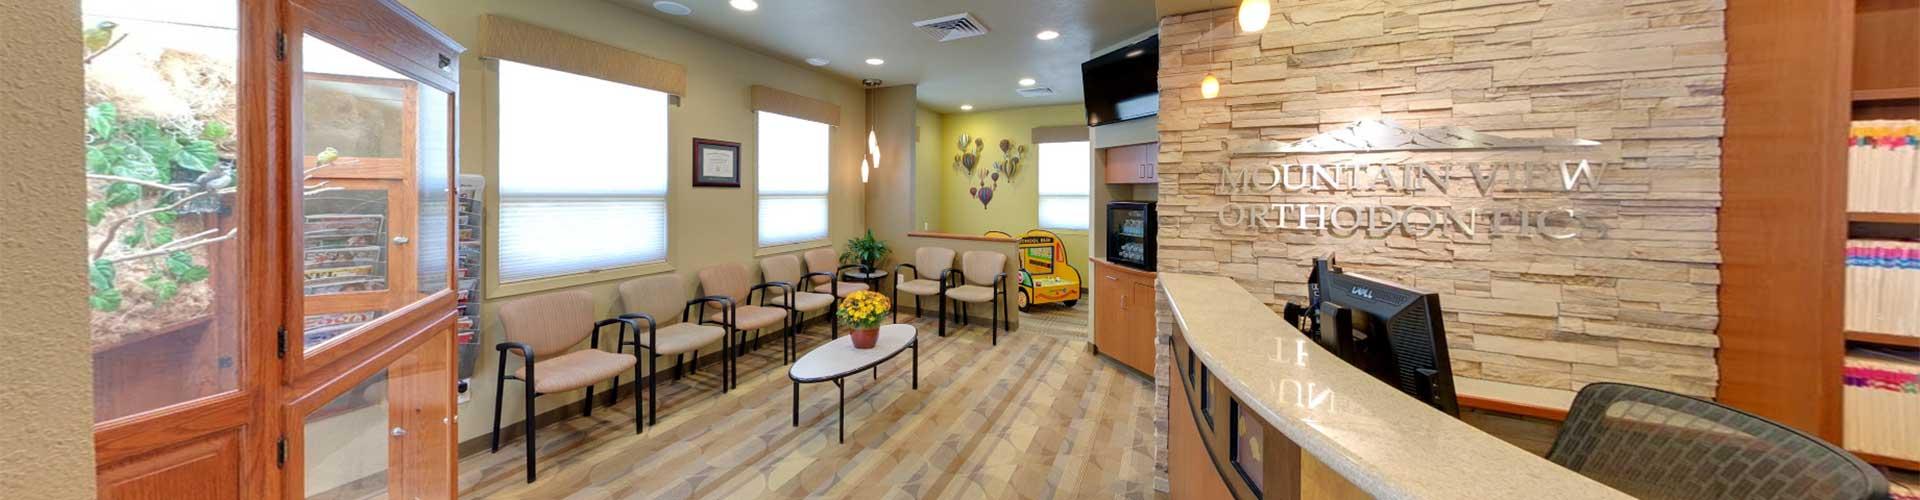 About Us Mountain View Orthodontics Longmont Berthoud CO